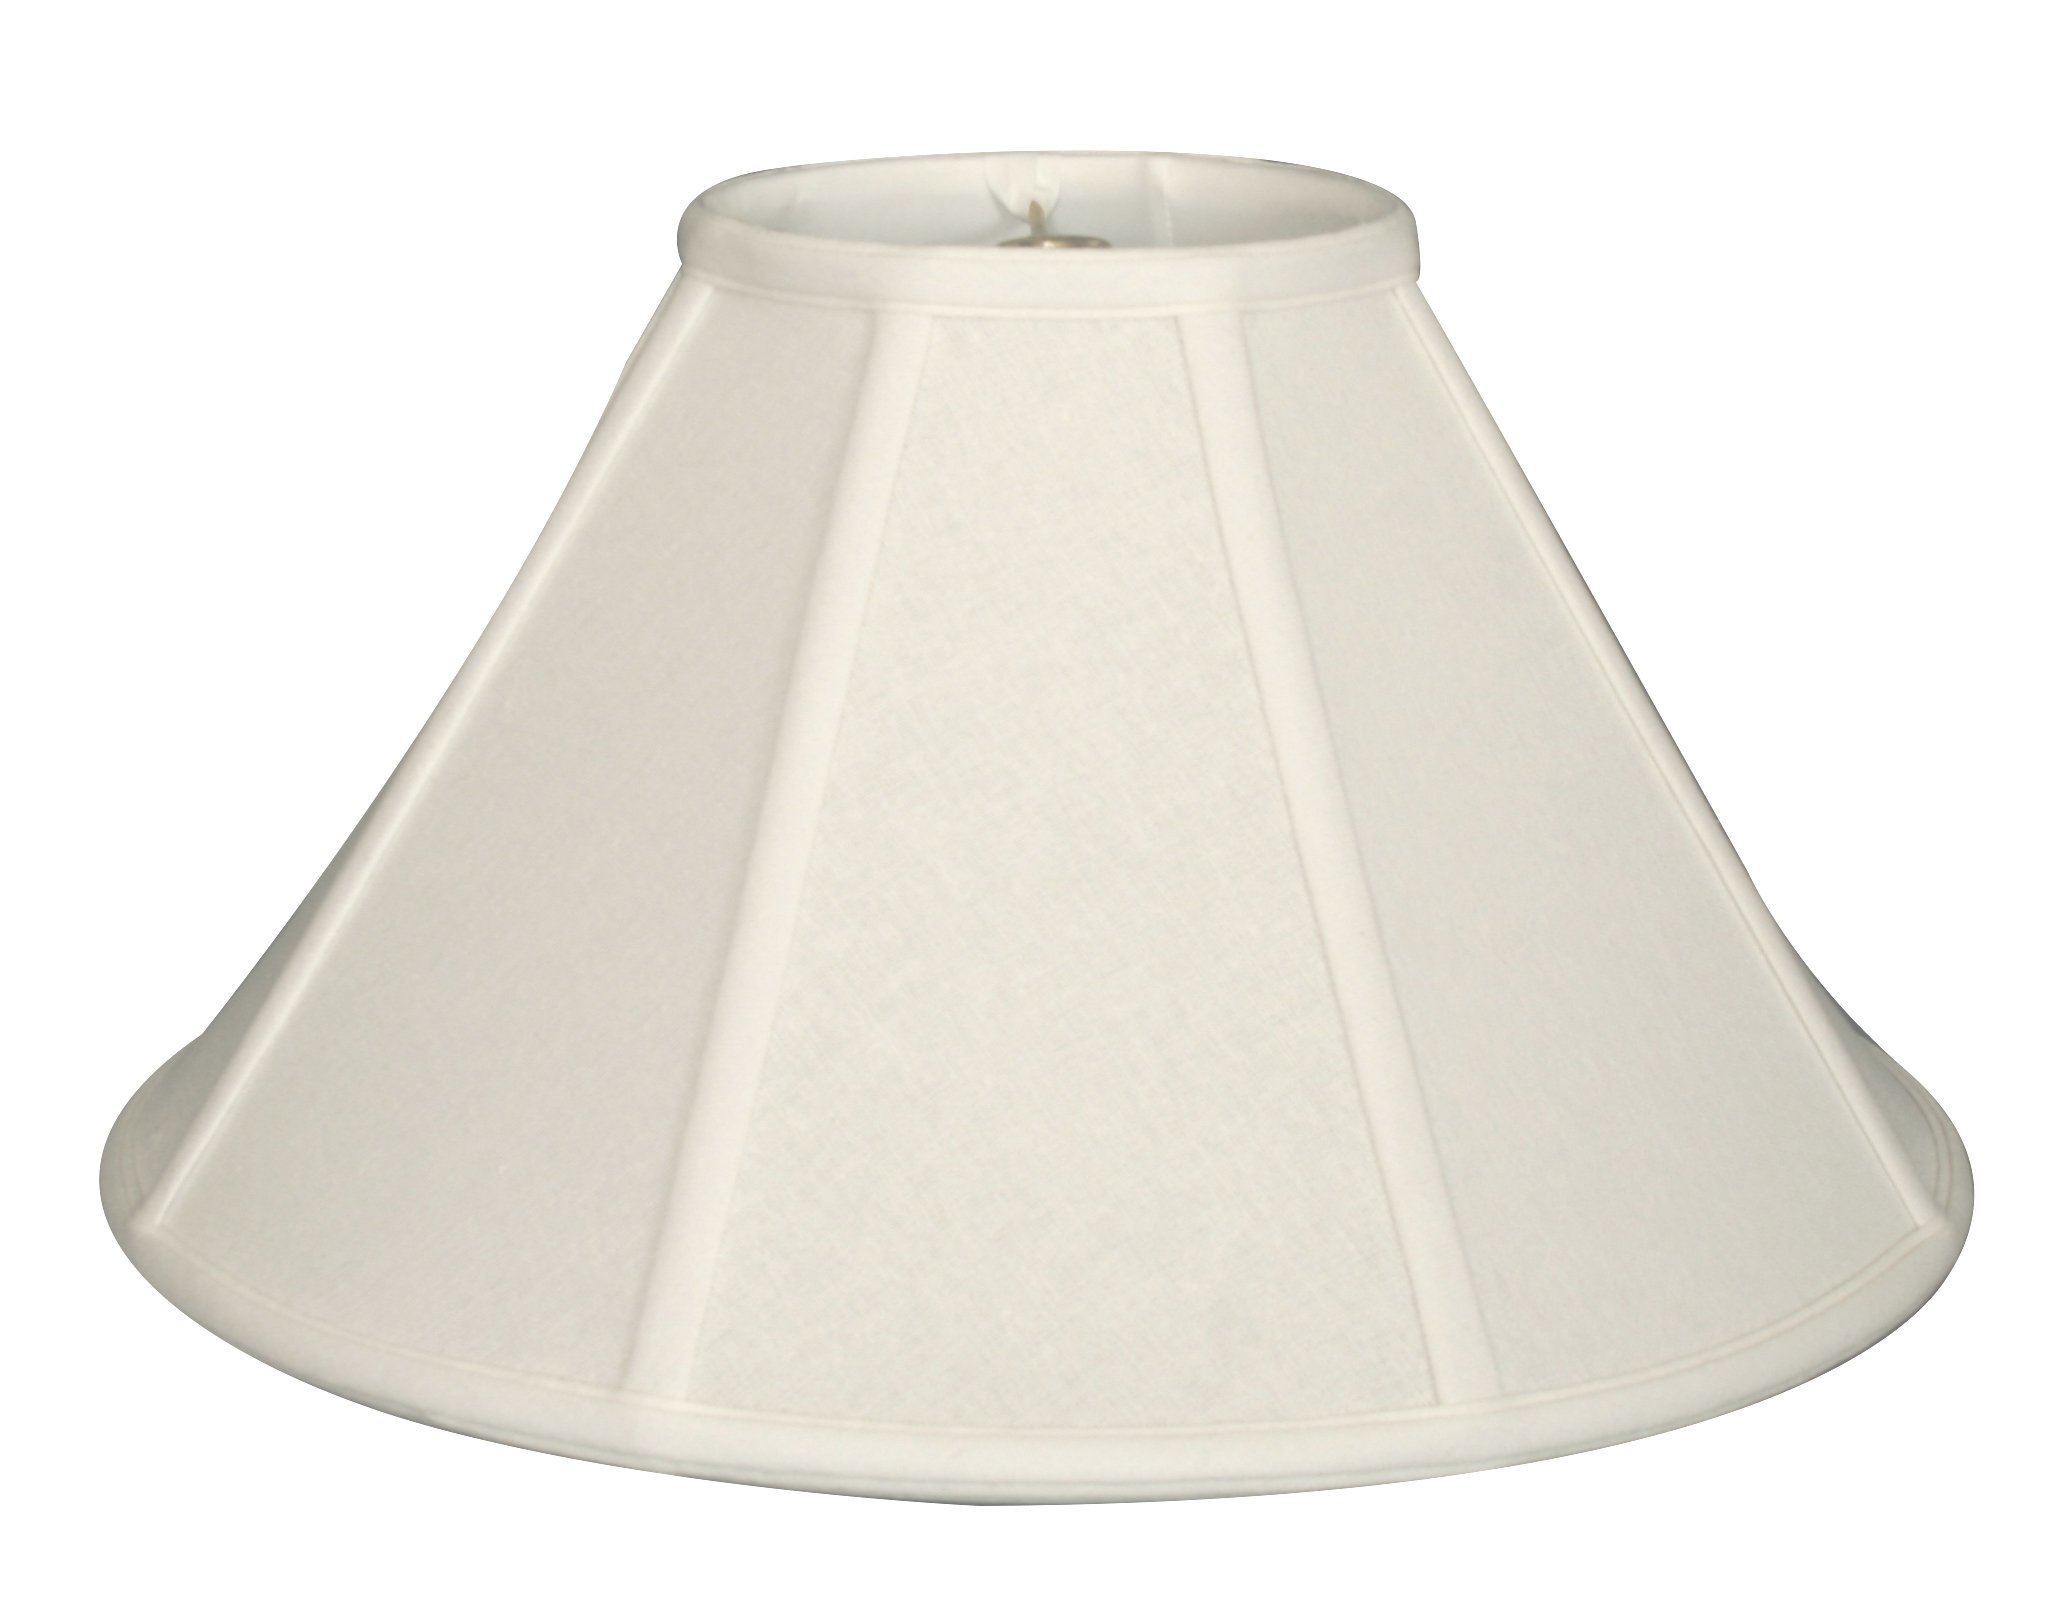 Royal Designs Empire Lamp Shade, Linen White, 8 x 22 x 13.25